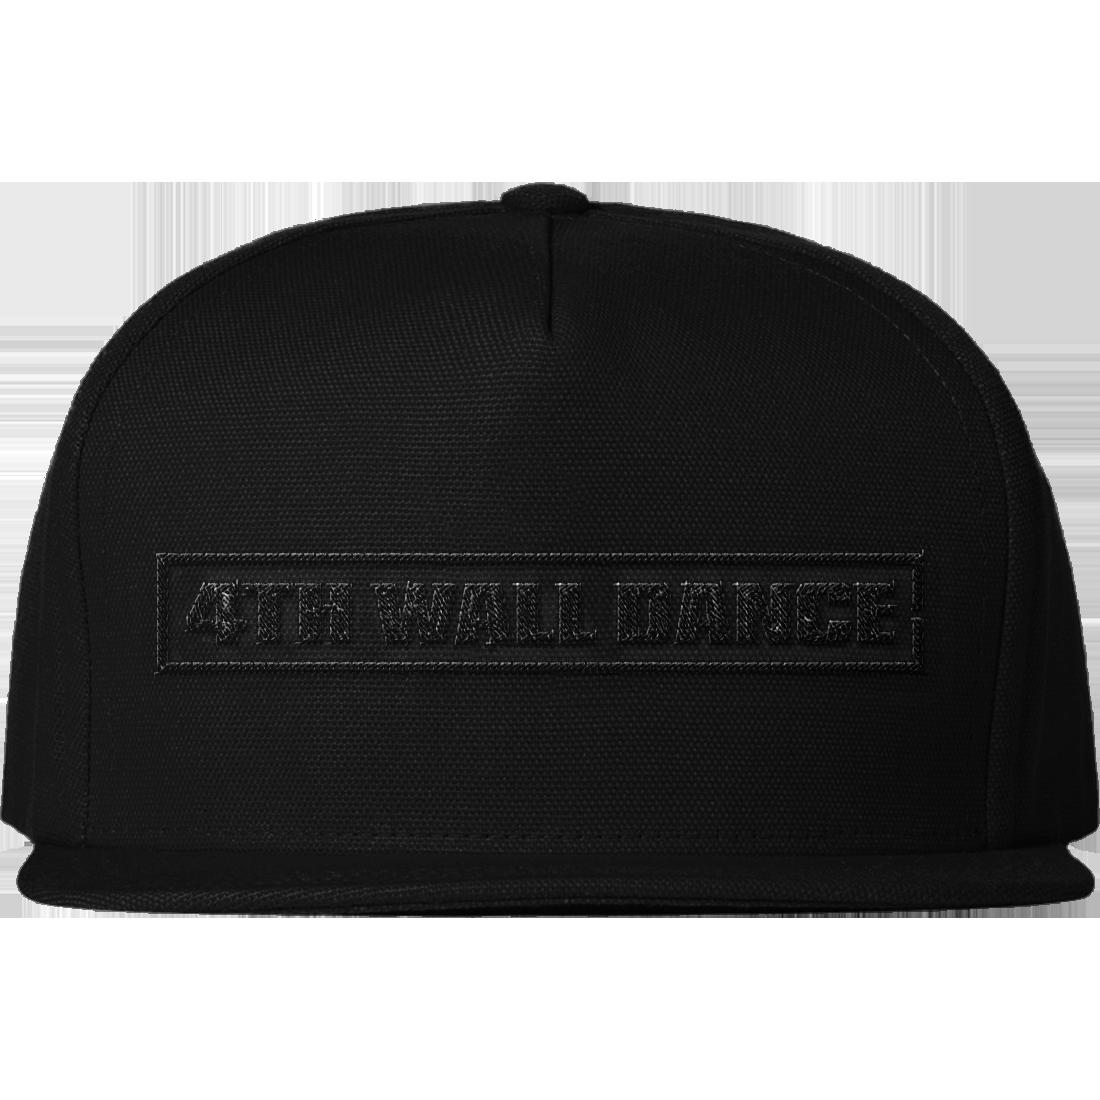 4WD-HAT-001